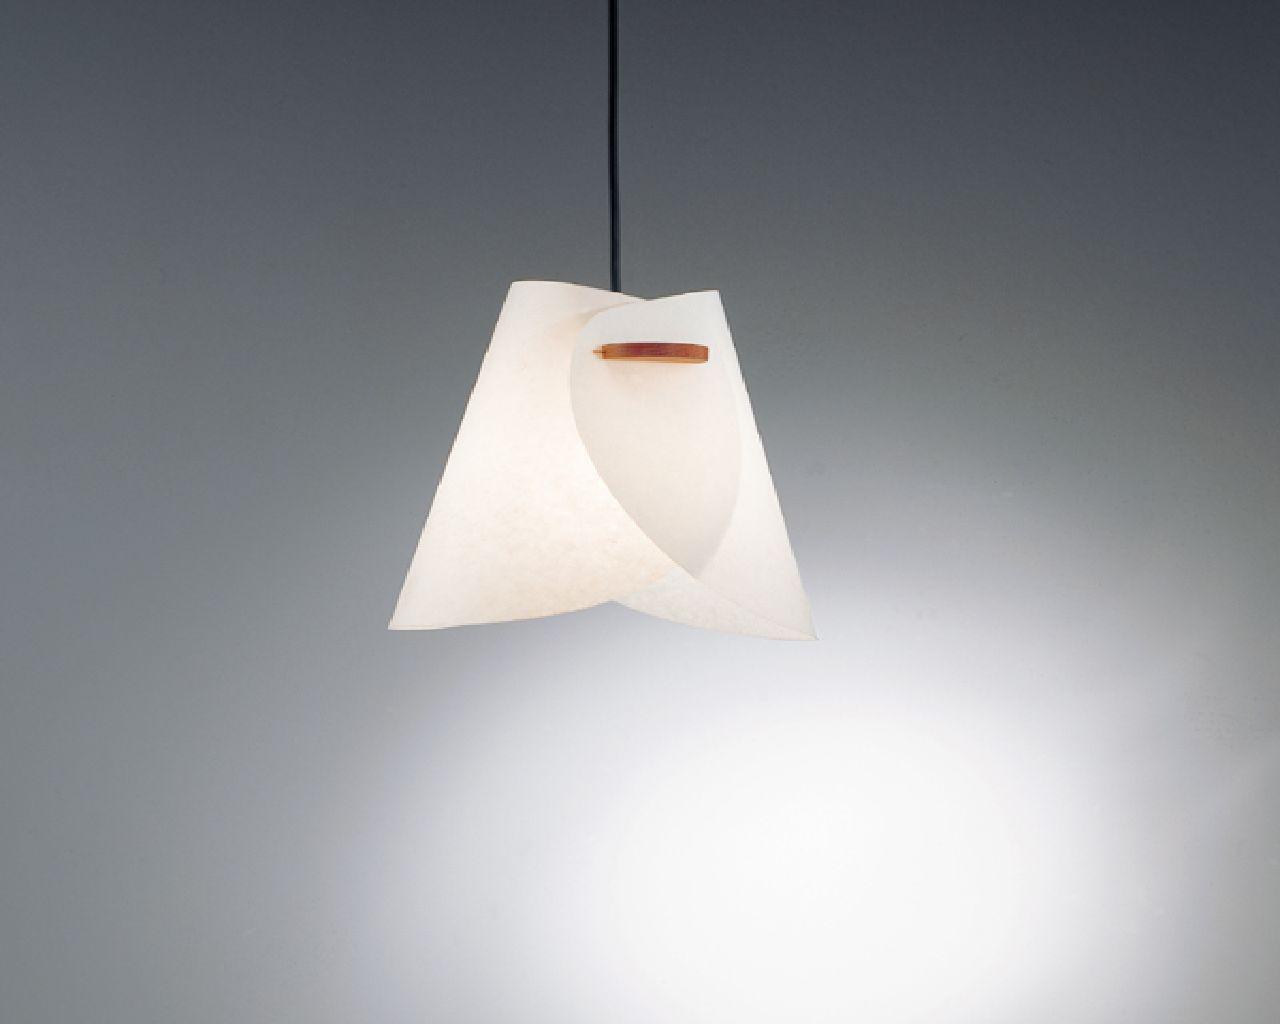 IRIS Pendelleuchte / IRIS Hanging lamp von DOMUS